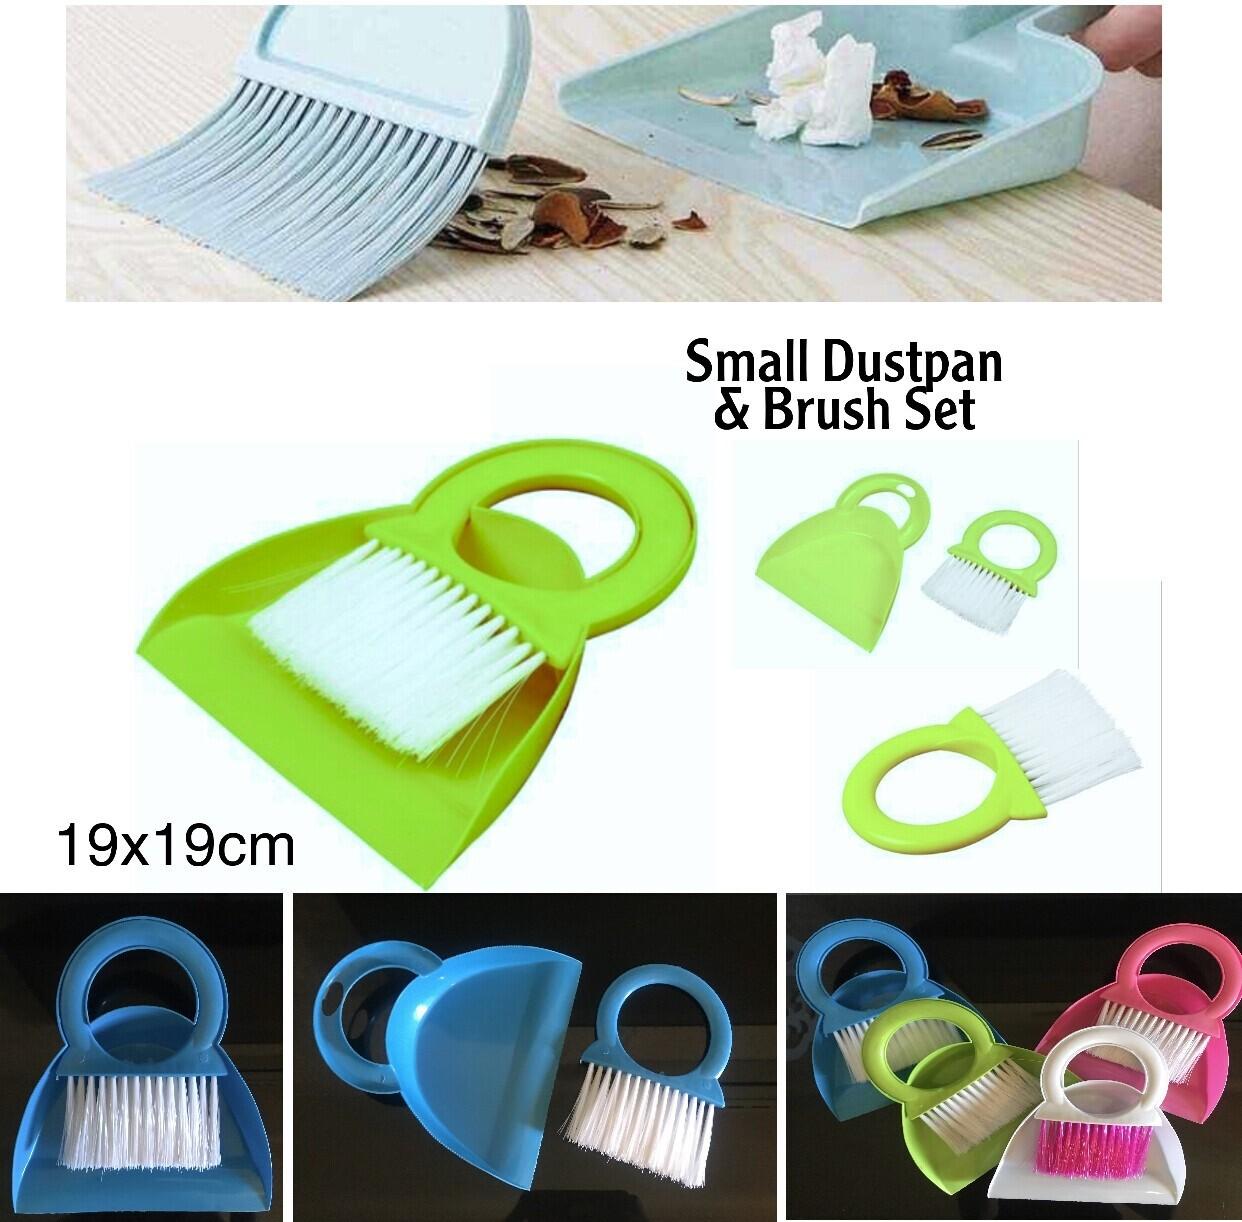 Small Dustpan/Brush